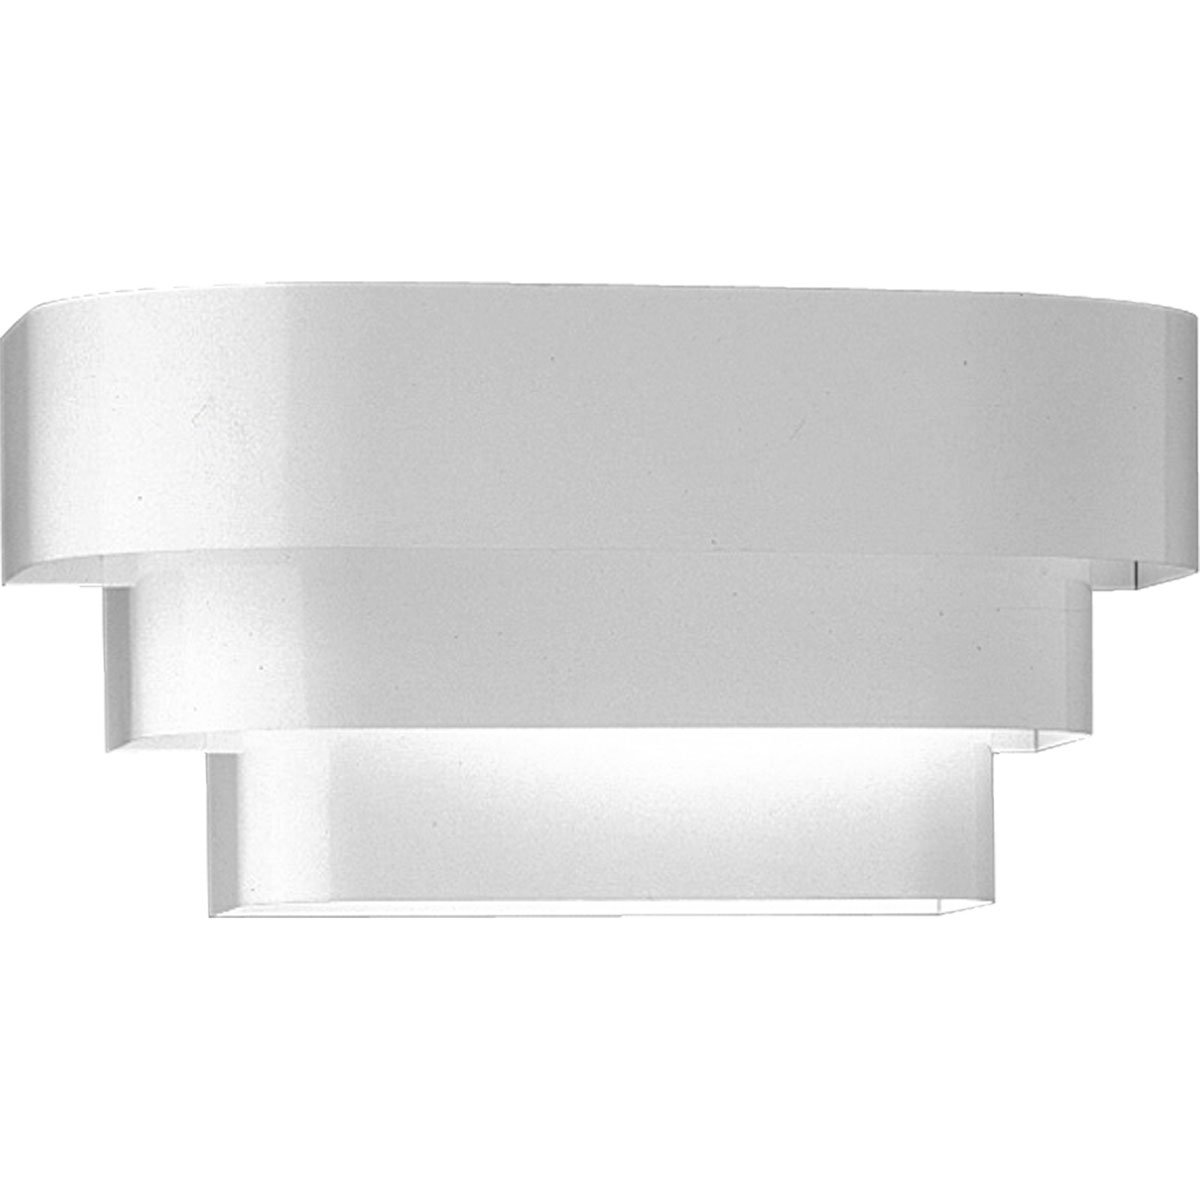 sconces wall lighting. Progress Lighting P7103-31 Tri-Band Wall Sconce, Black, \u0026 Ceiling Fans - Amazon Canada Sconces D